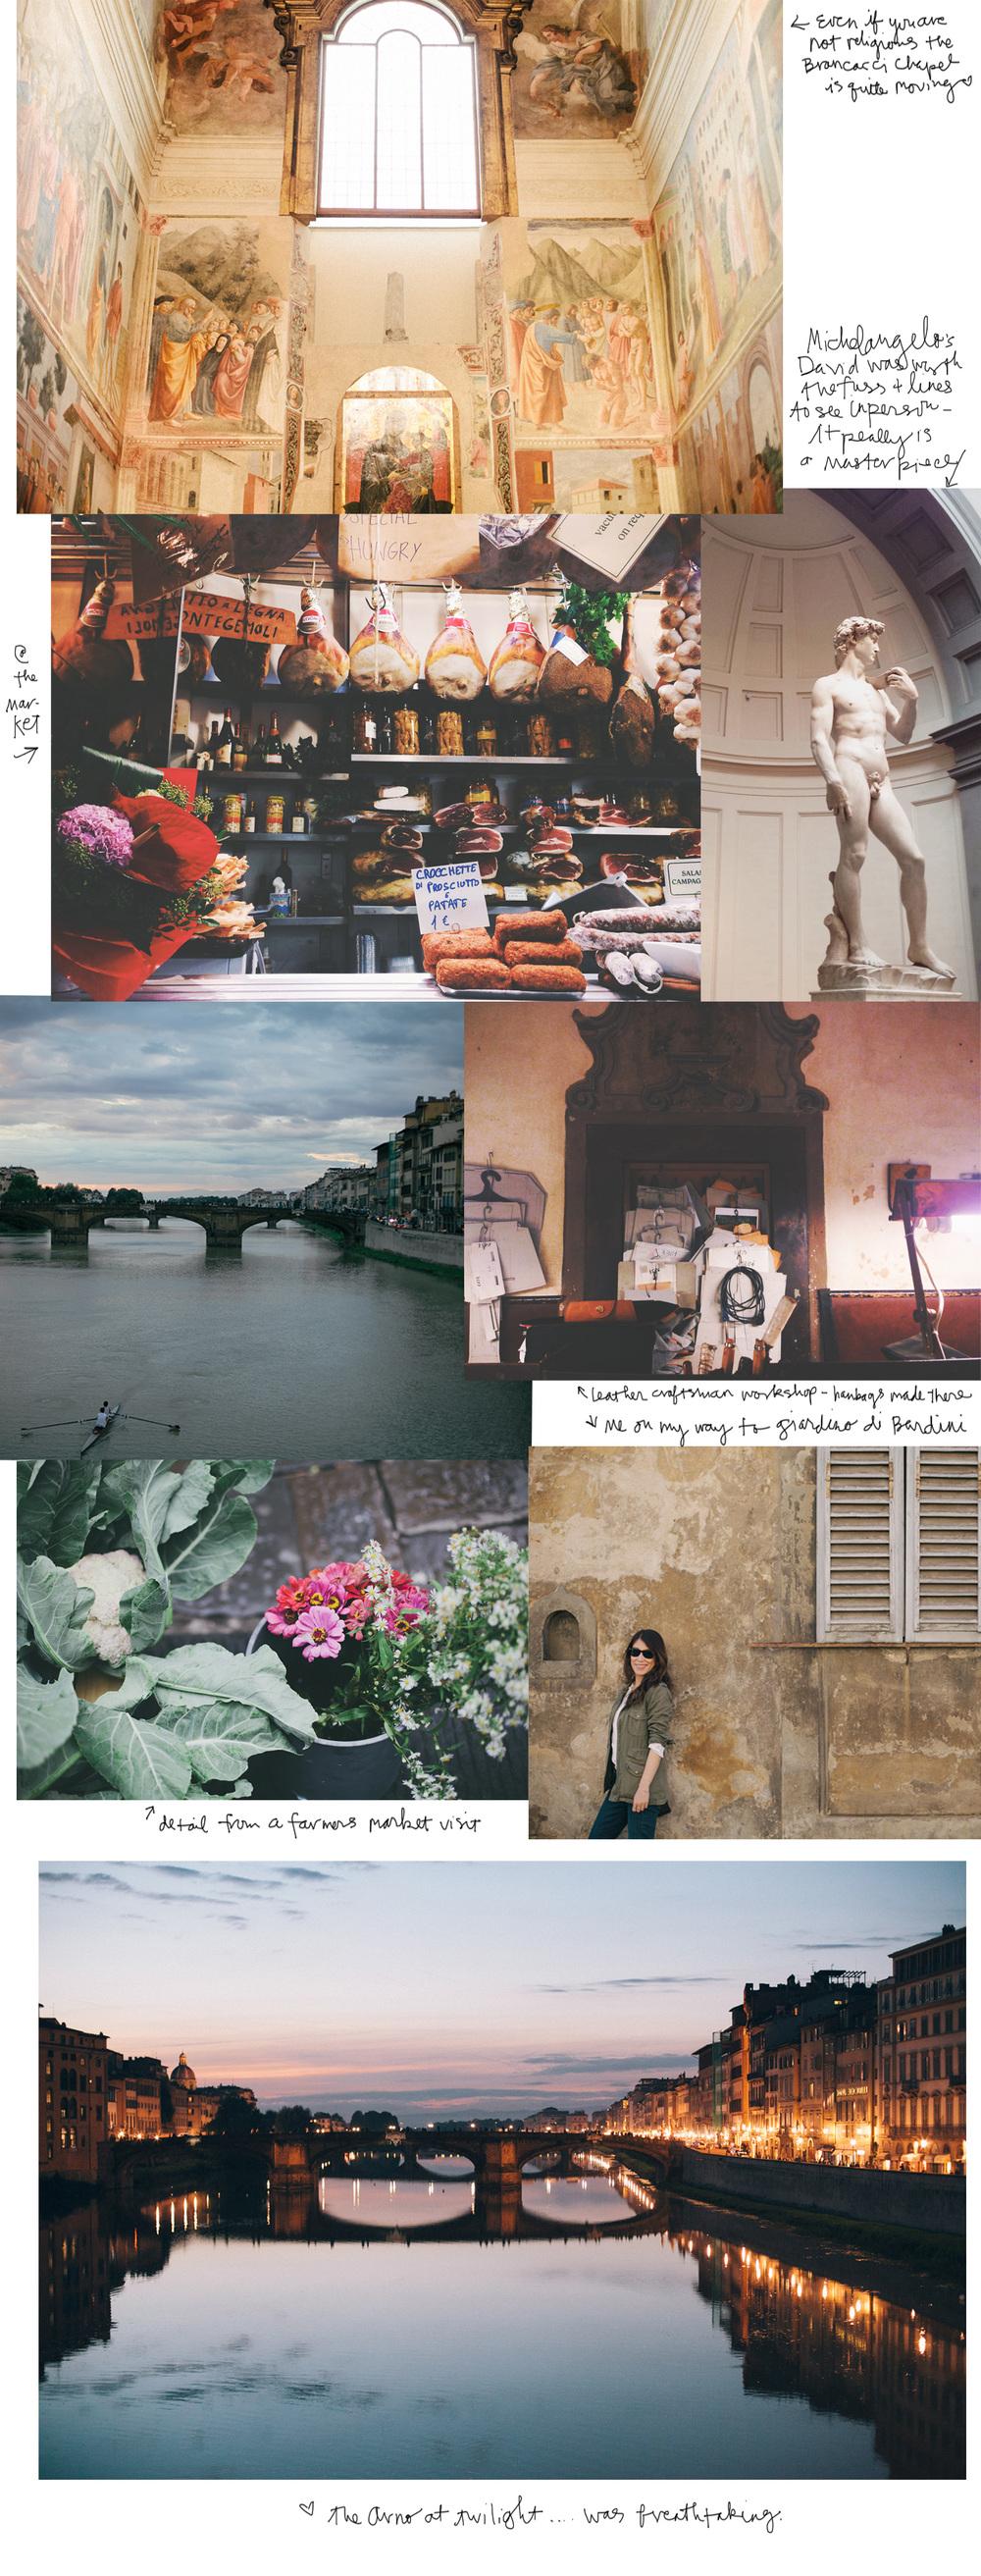 Italy-Florence-by Naomi Yamada.jpg